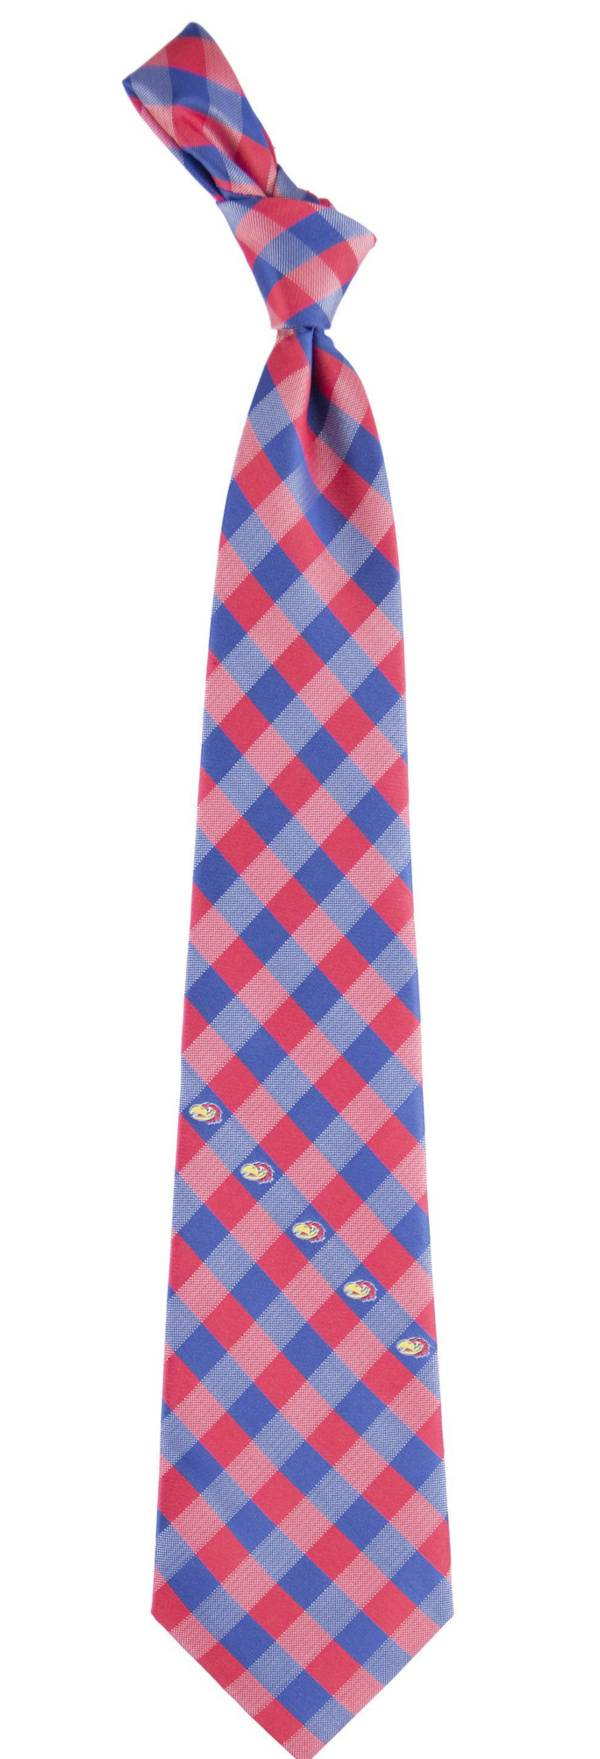 Eagles Wings Kansas Jayhawks Check Necktie product image